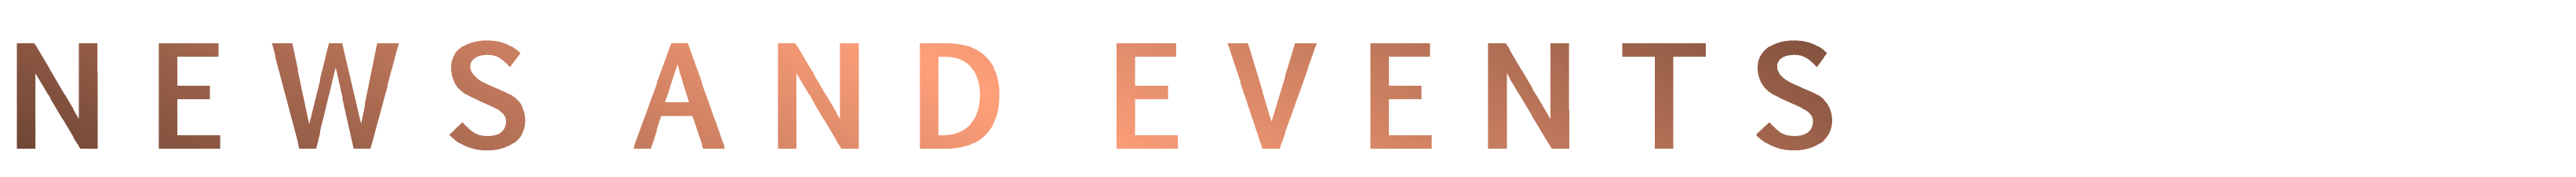 title-news-2